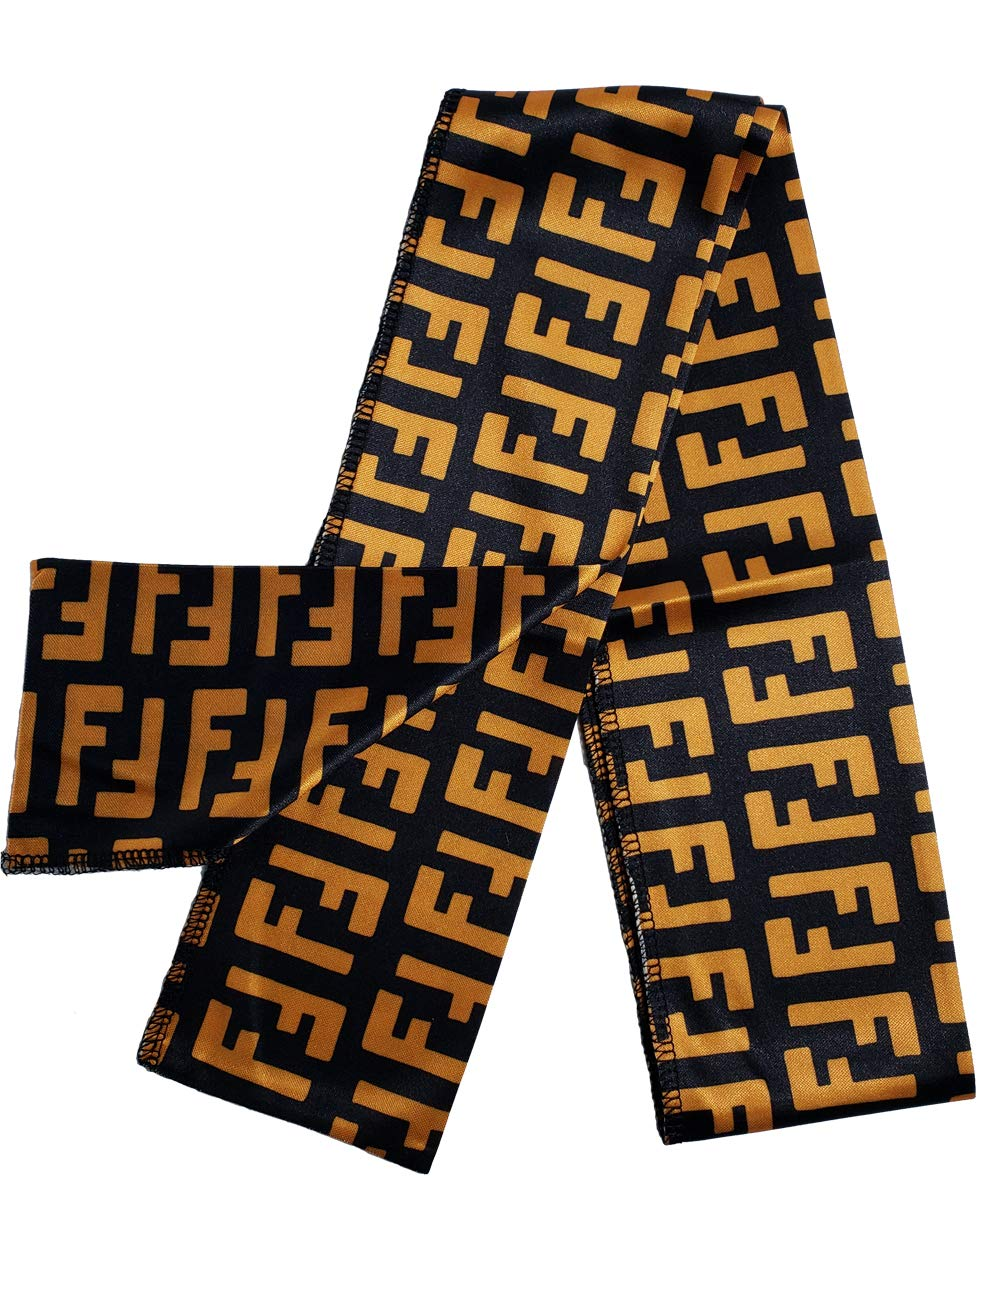 EroTouch Apparel Customs Designer Headbands,Headwrap,Luxury,Limited,Exclusive (FF Graffiti Black)